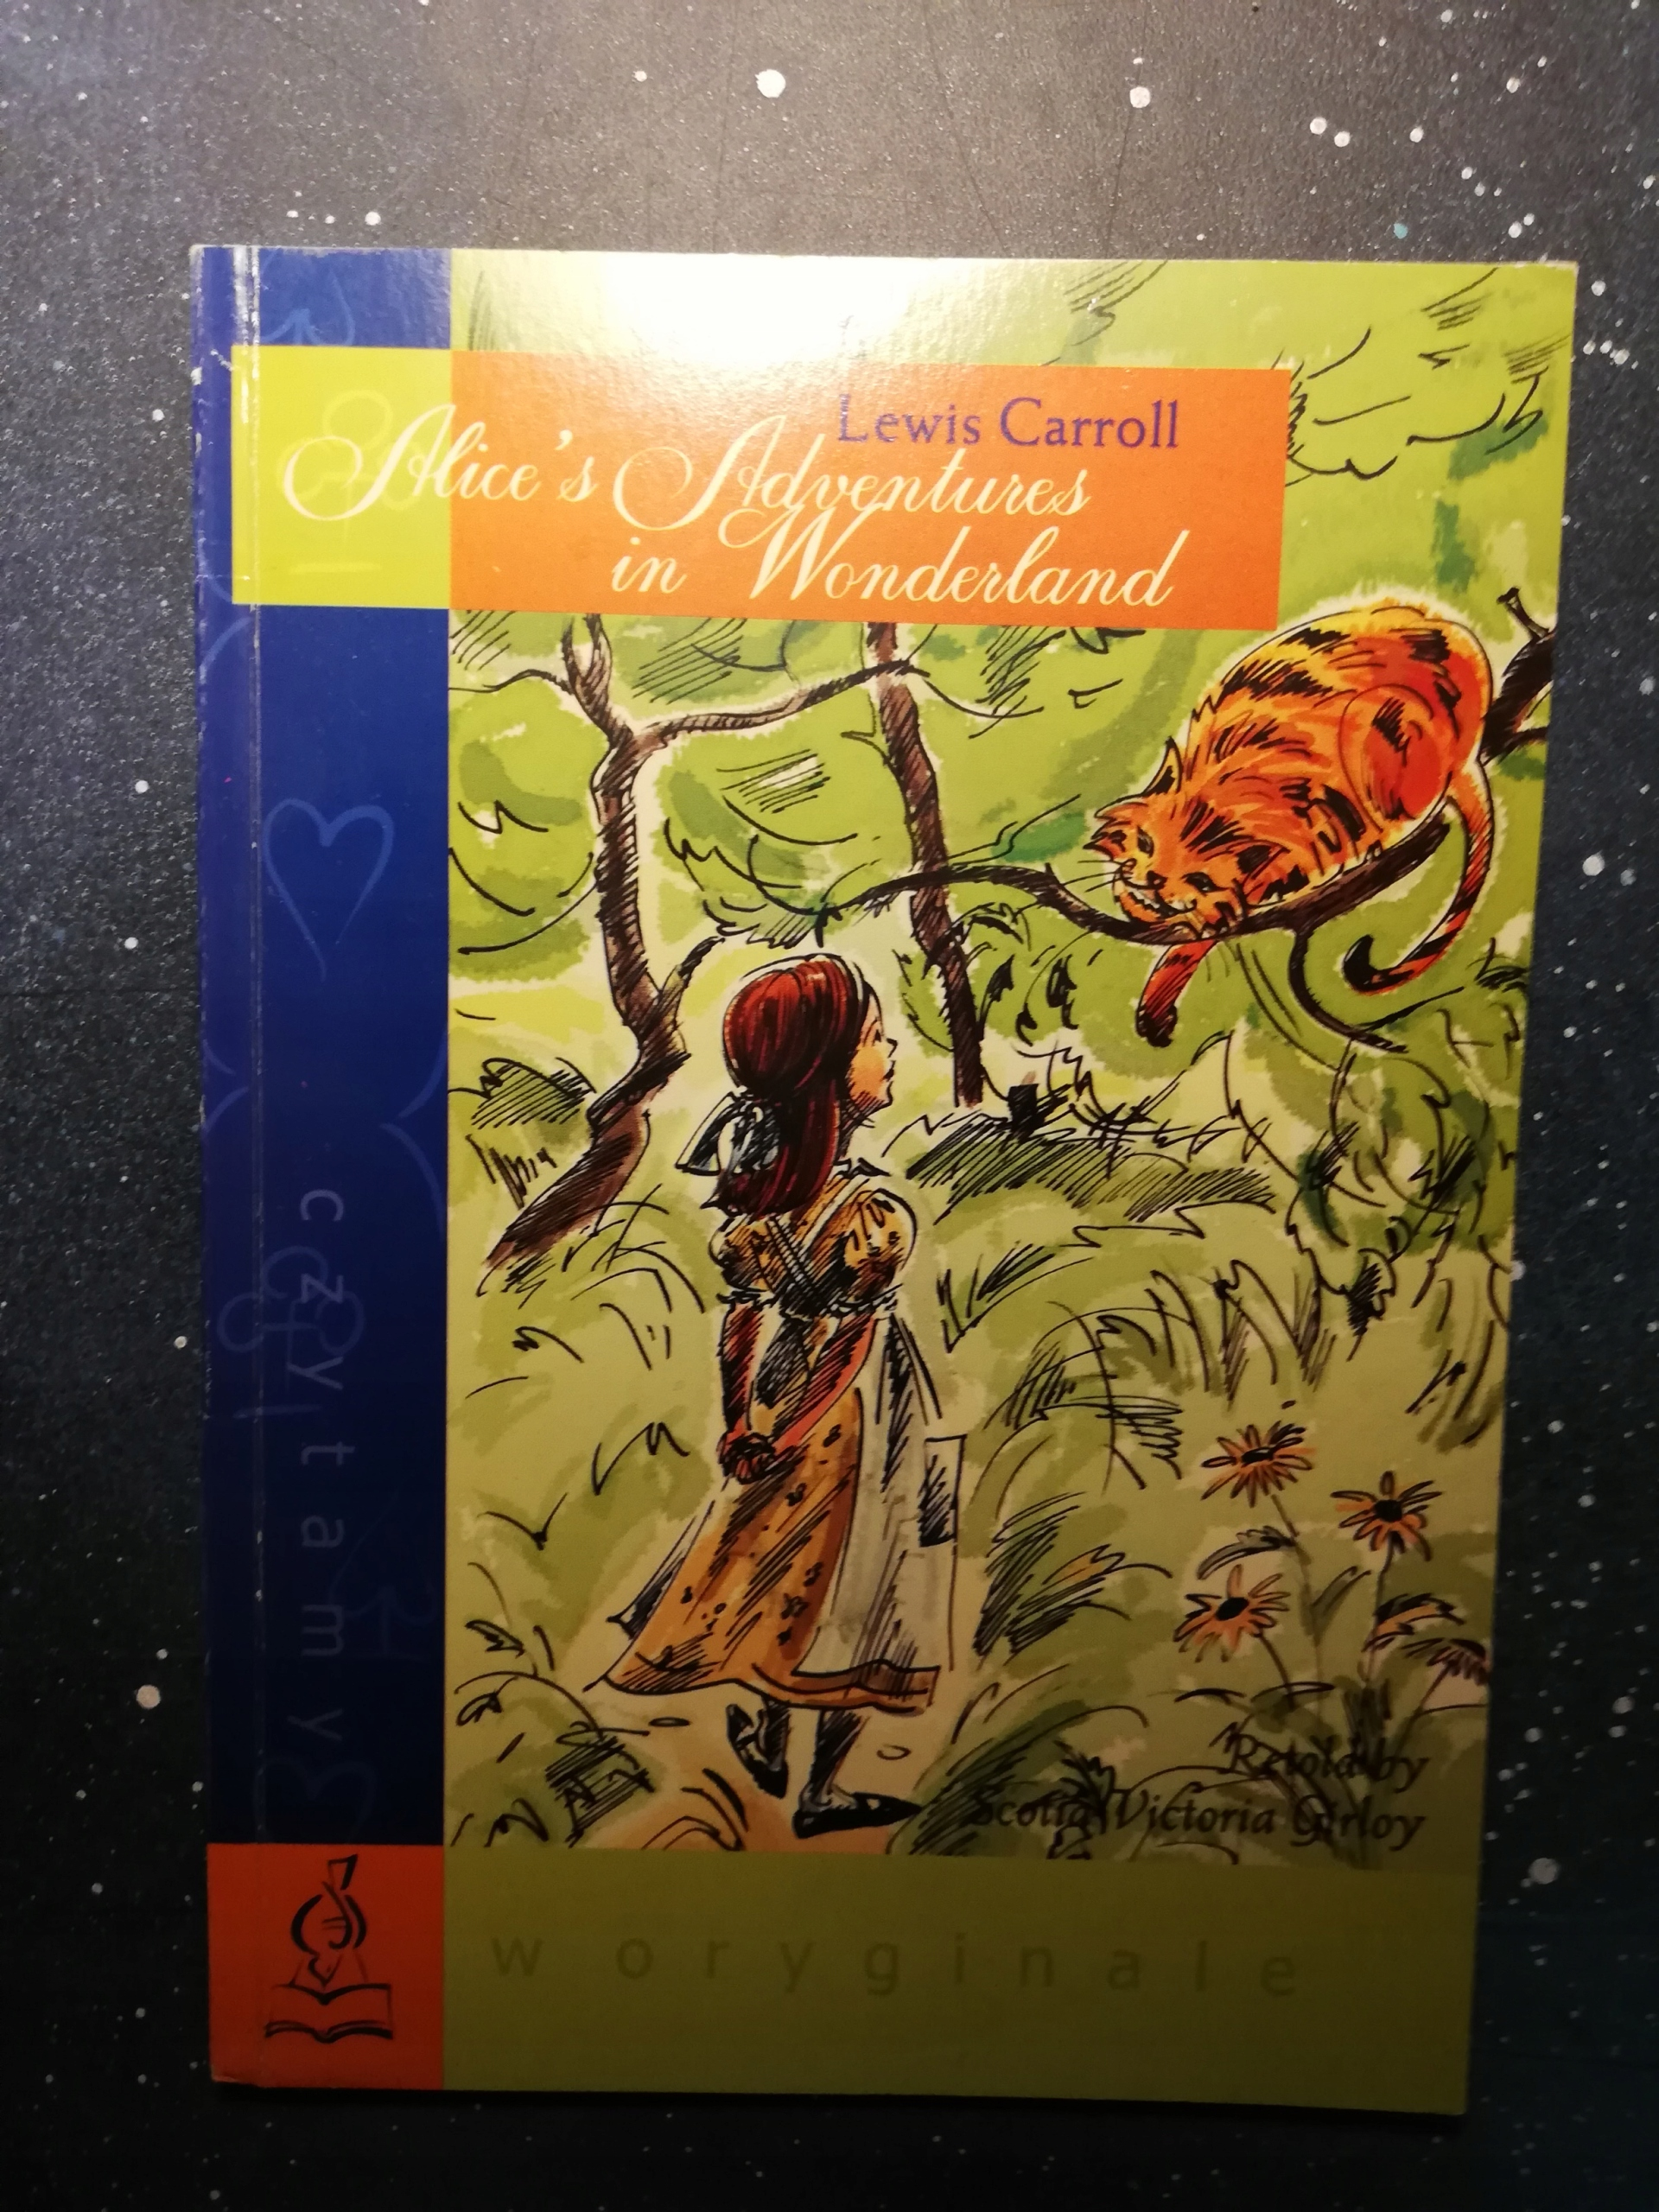 Carroll L. - Alice's Adventures in Wonderland